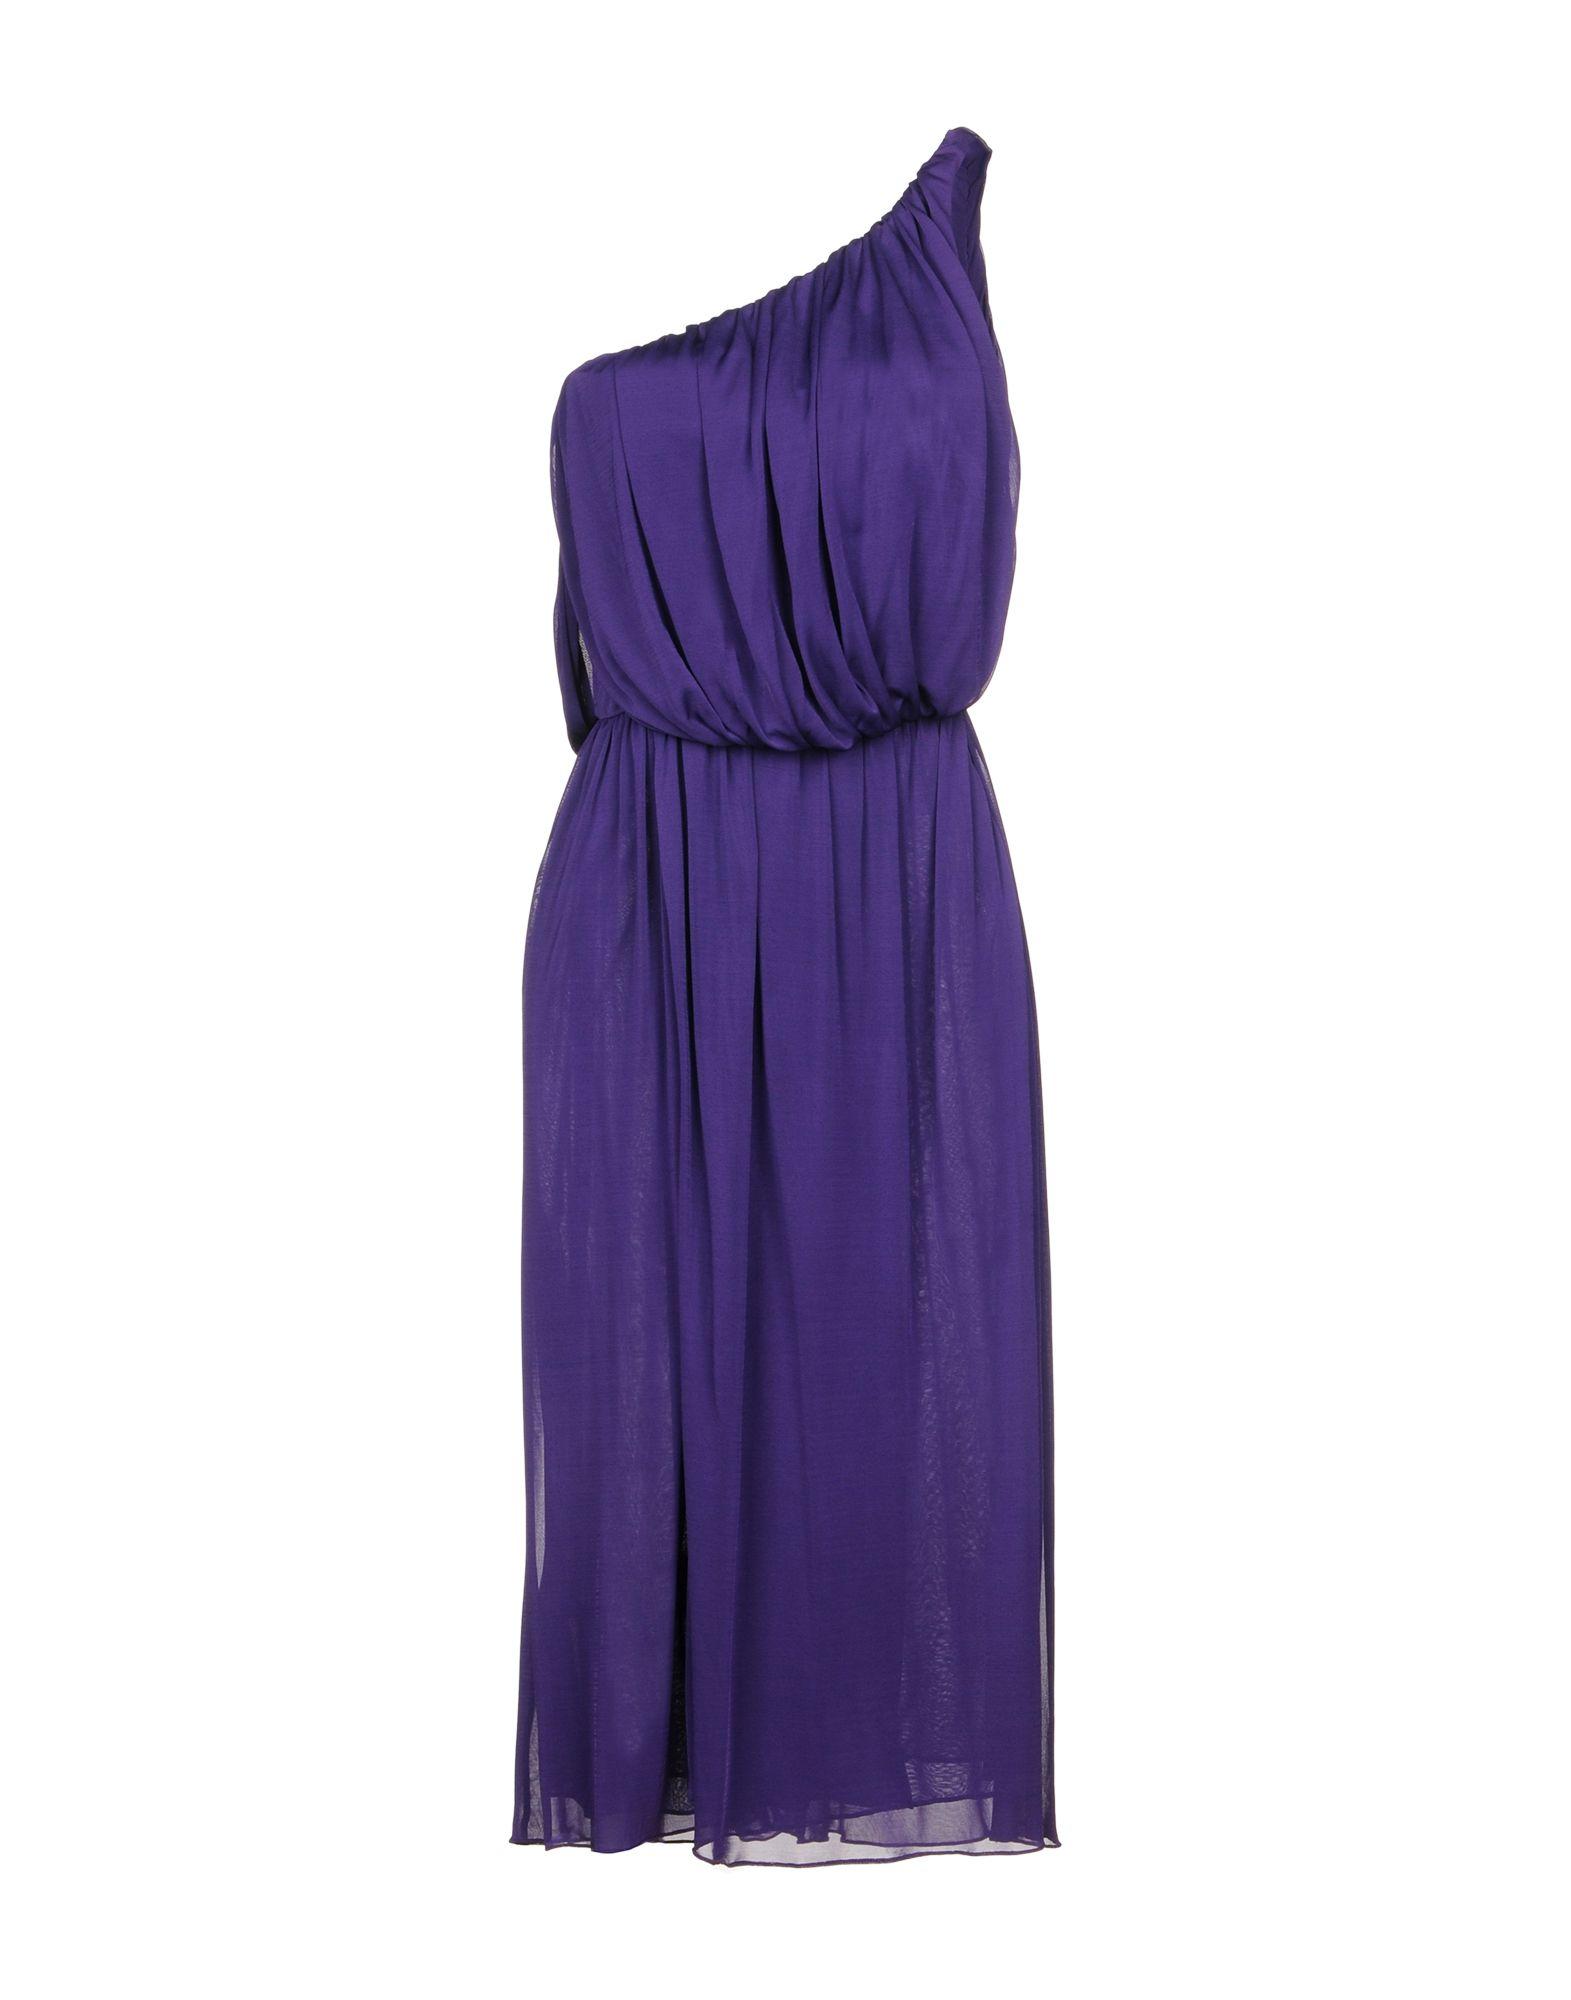 Halston KNEE-LENGTH DRESSES